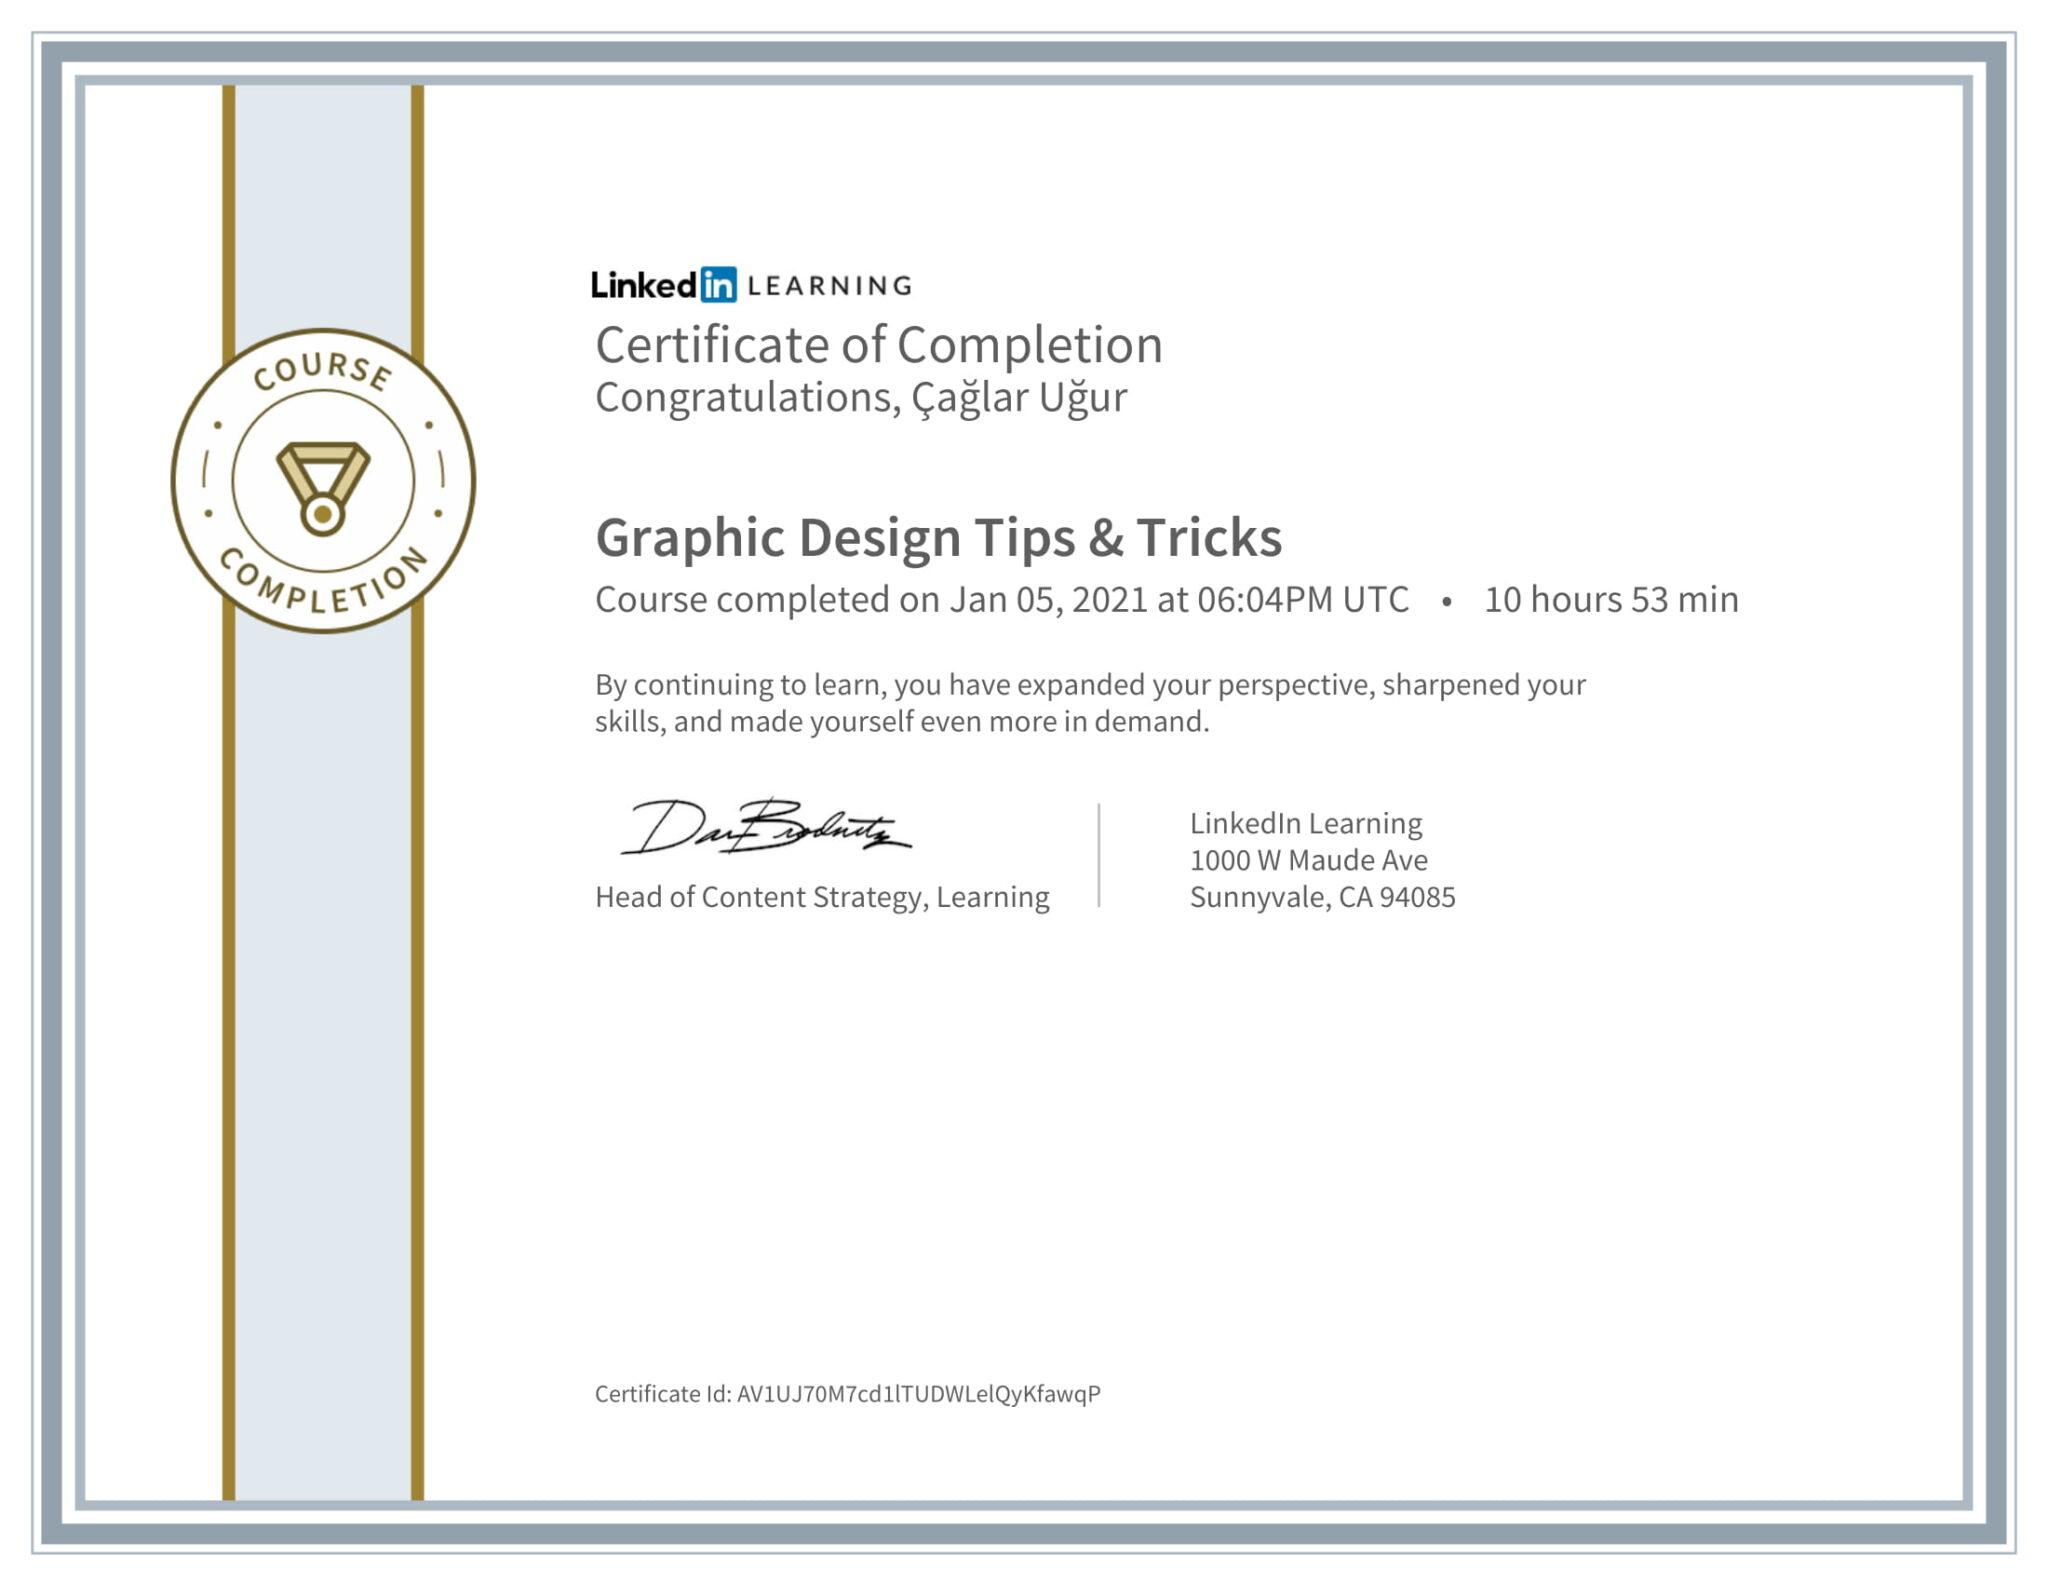 Linkedin JohnMcWade Graphic Design Certificate